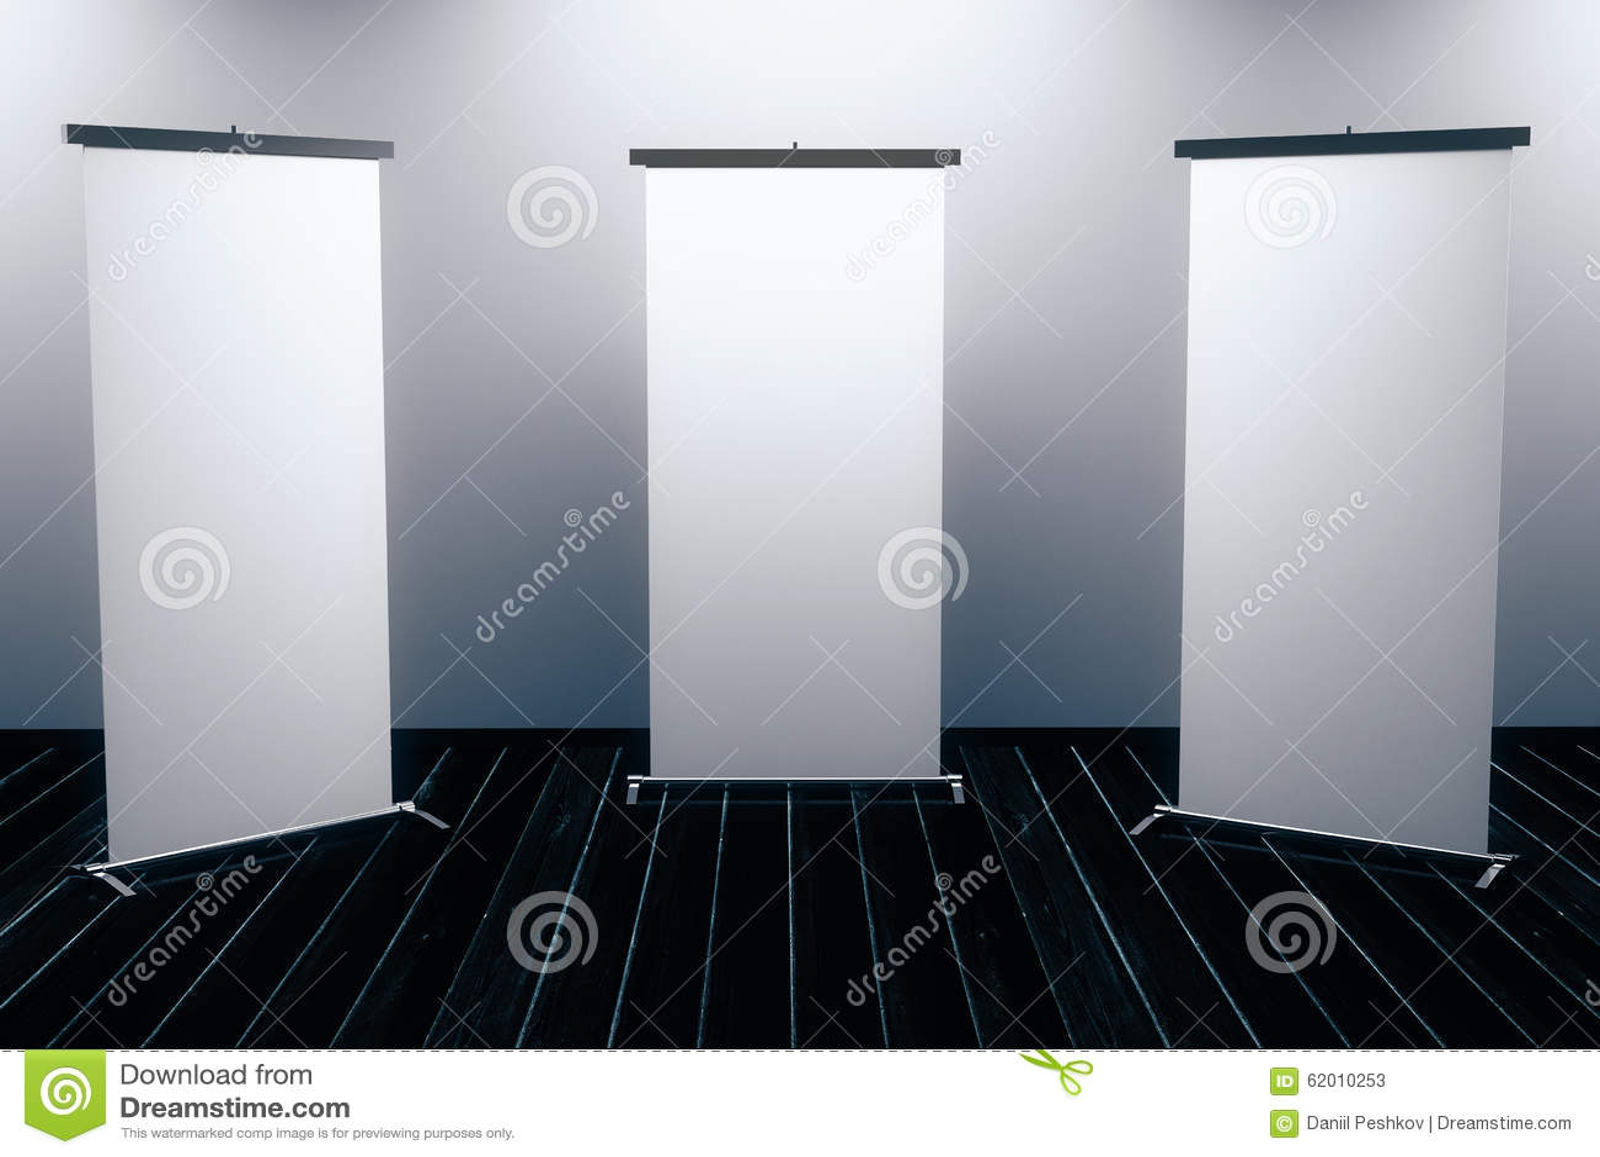 Lege affiches op zwarte houten vloer met backlight stock